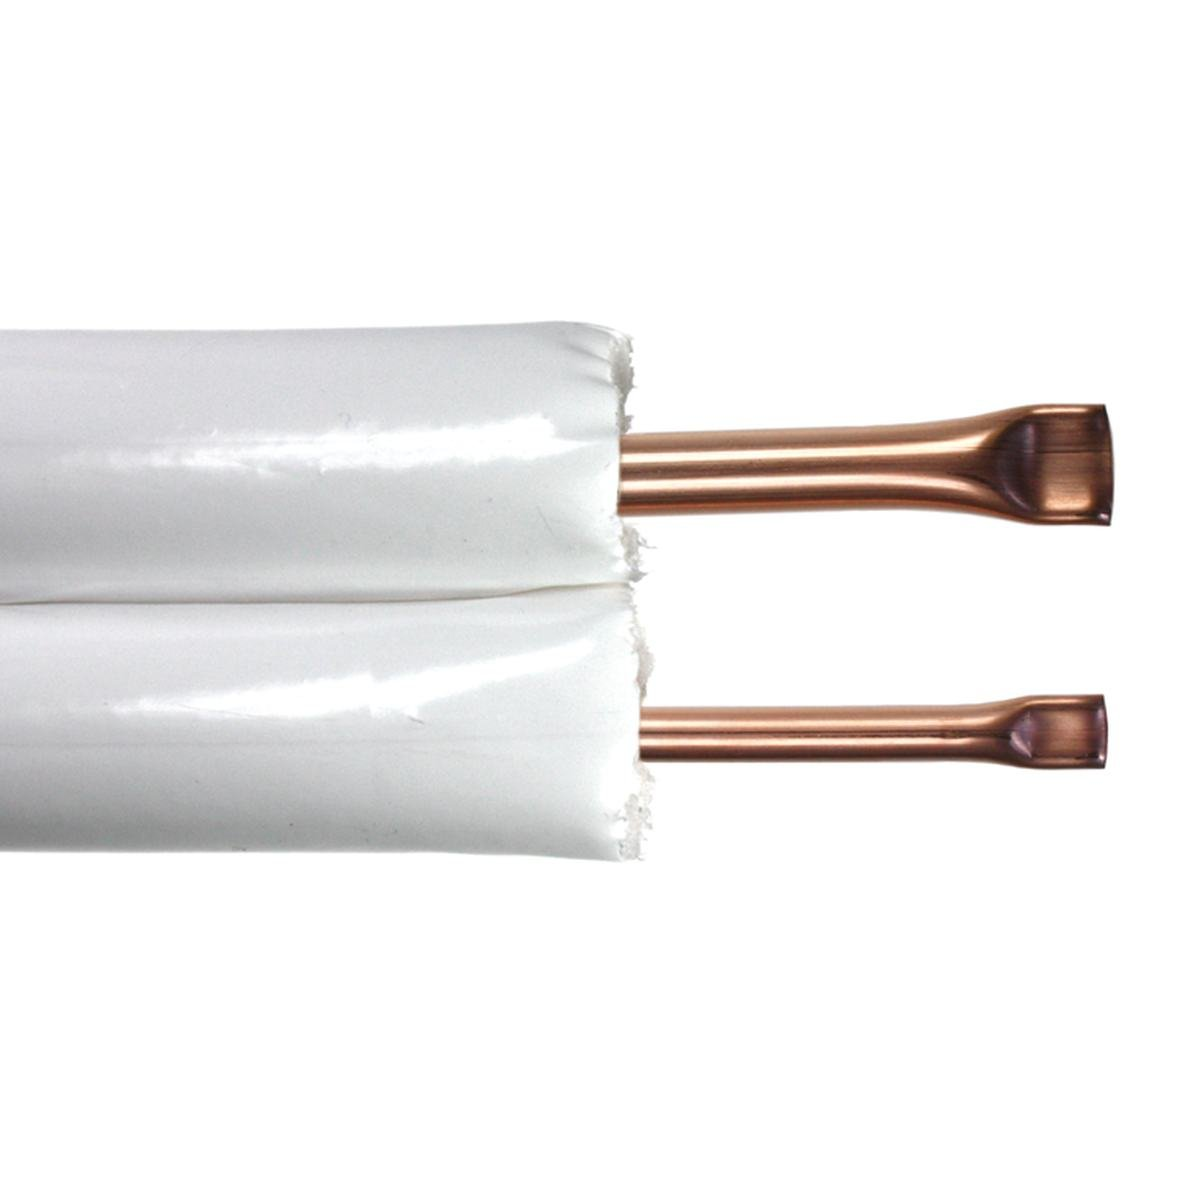 "Kopparrör dubbel 1/4"" x 3/8"" x 0,7 mm. 20 meter gl"